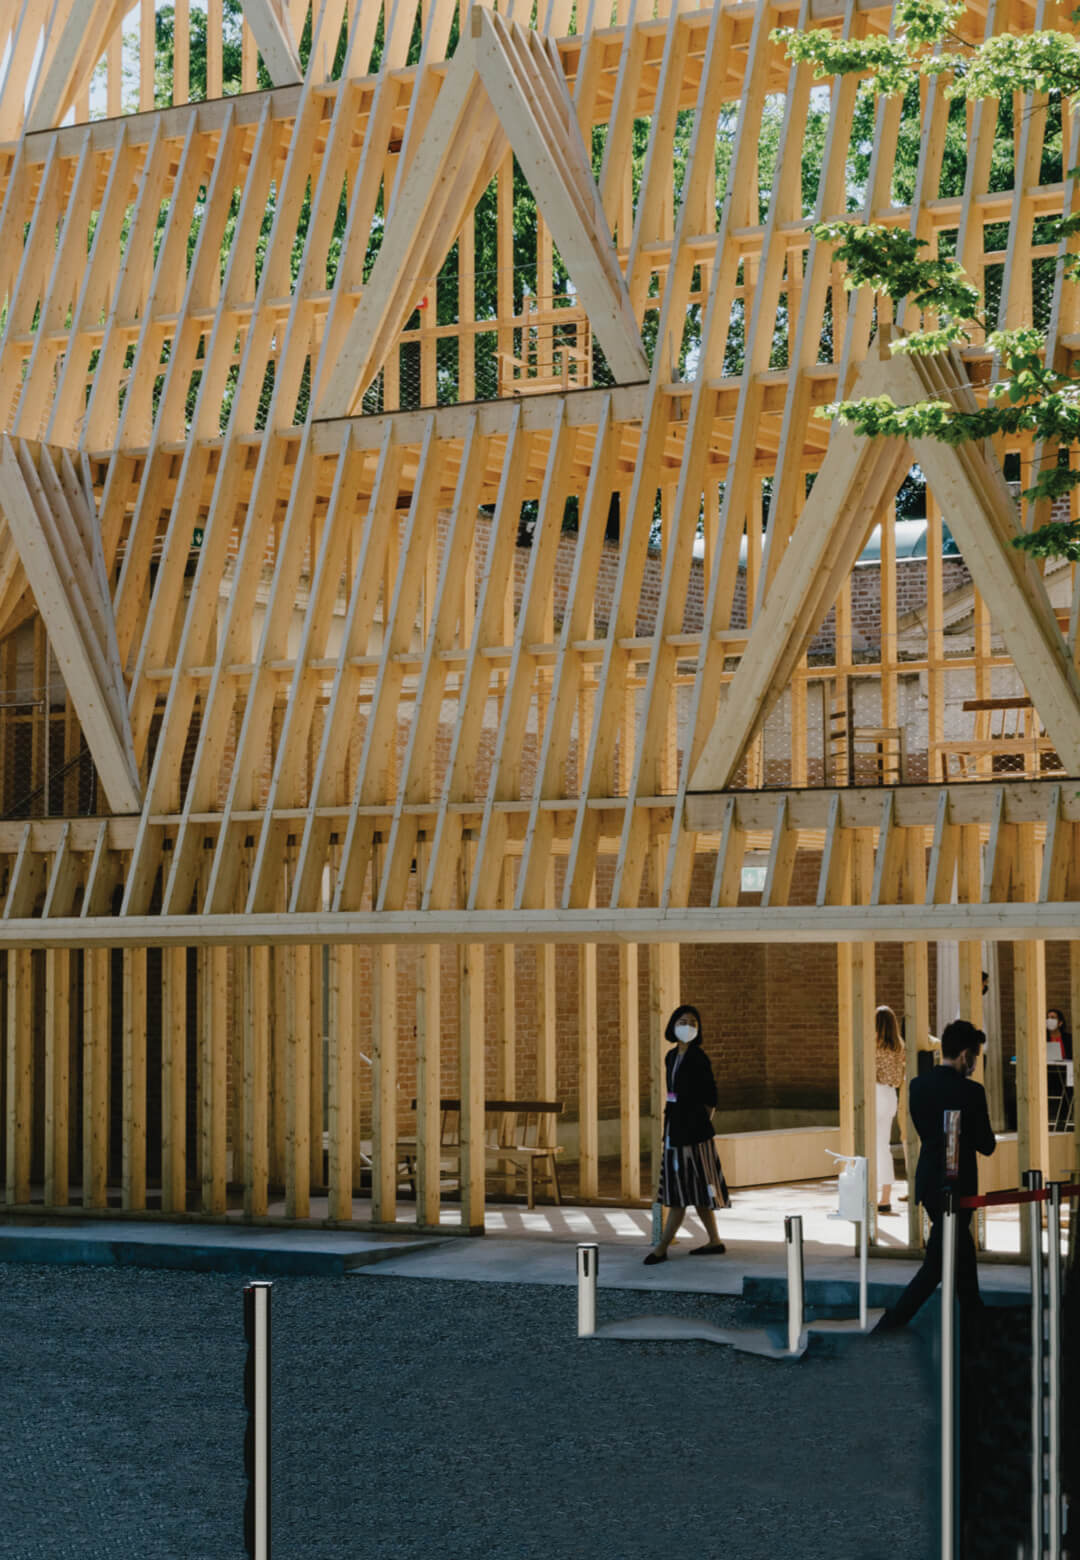 American Framing, U.S. Pavilion, Giardini | Venice Architecture Biennale 2021 | Vladimir Belogolovsky | STIRworld